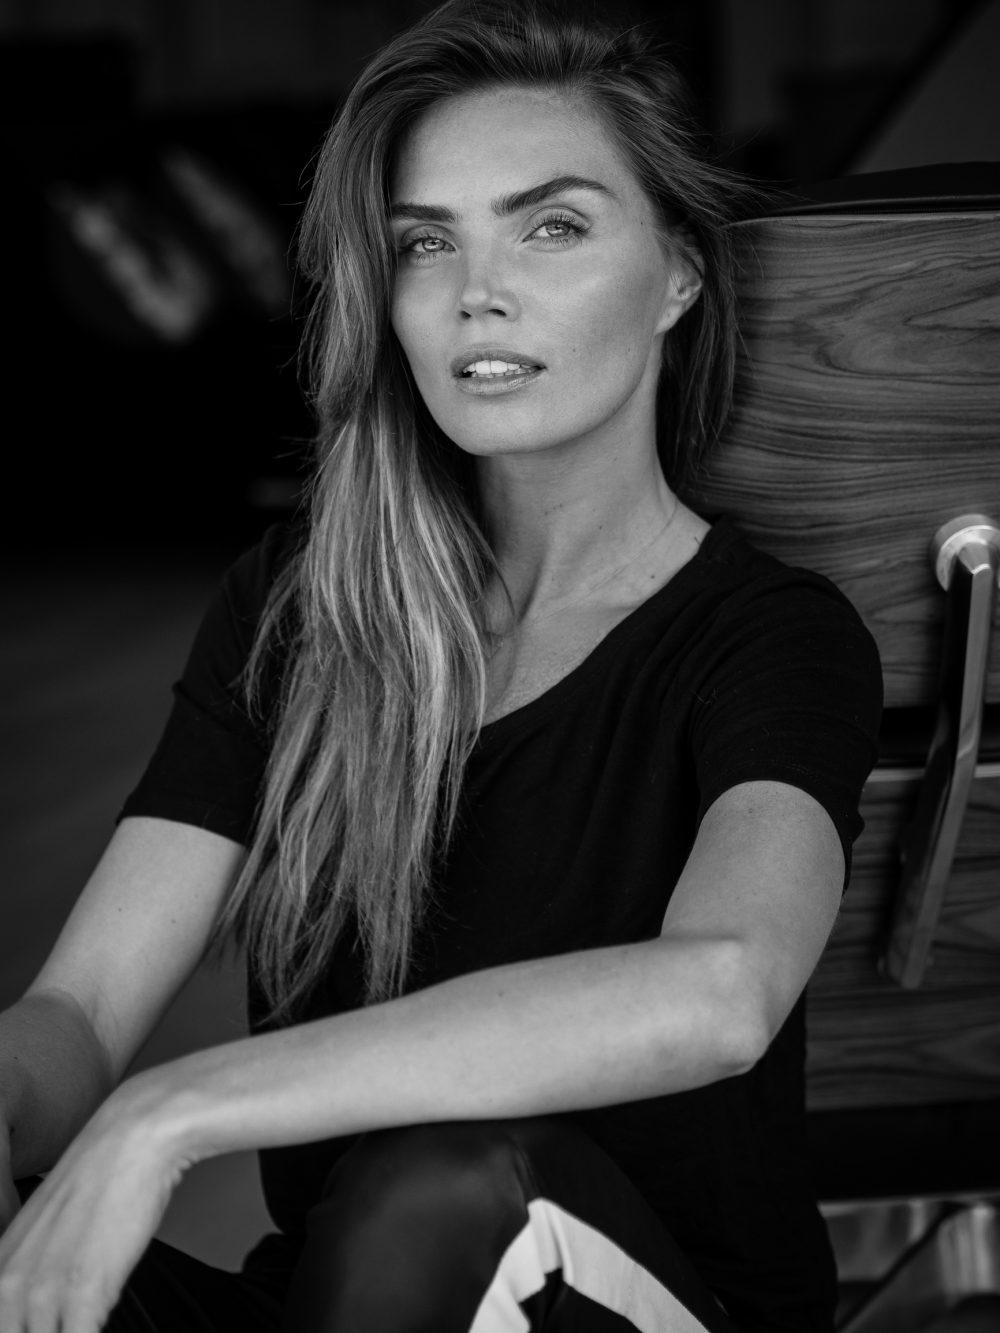 Paparazzi Kim Feenstra nude photos 2019